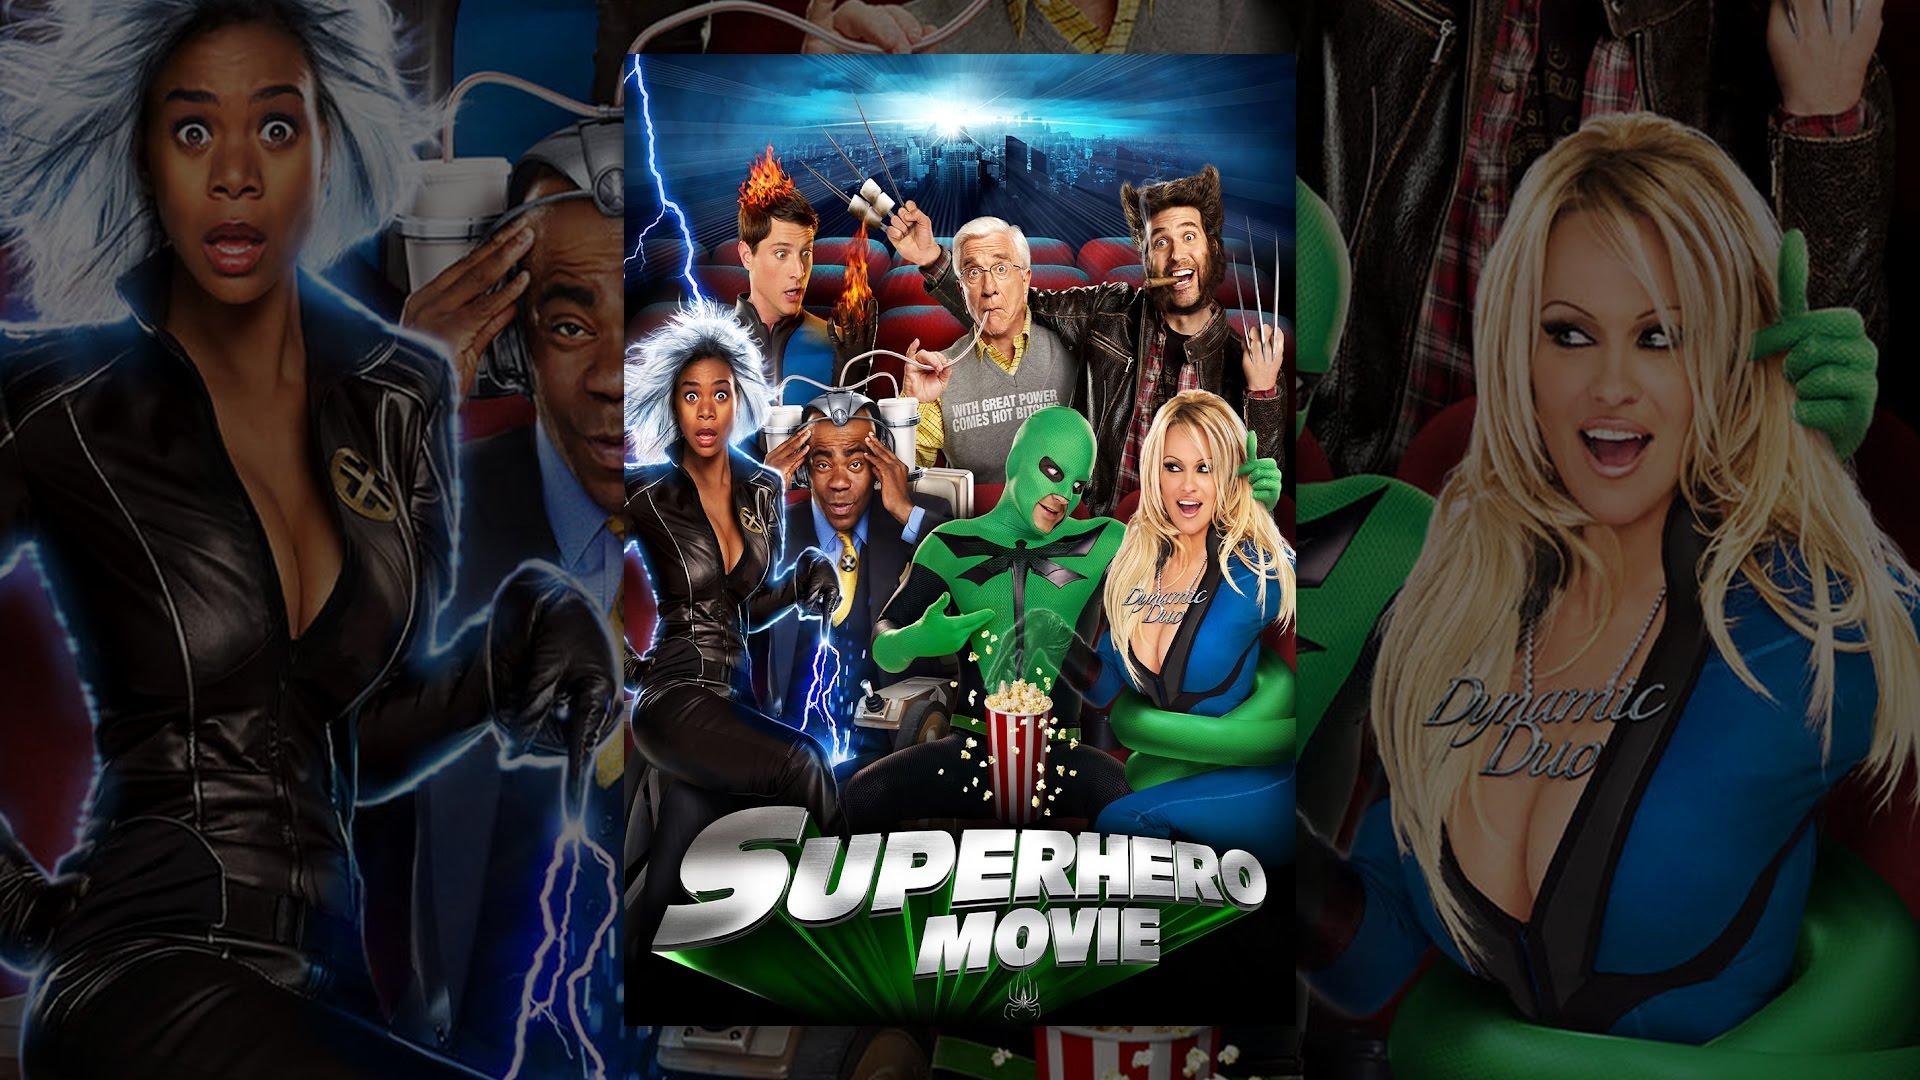 Download Superhero Movie